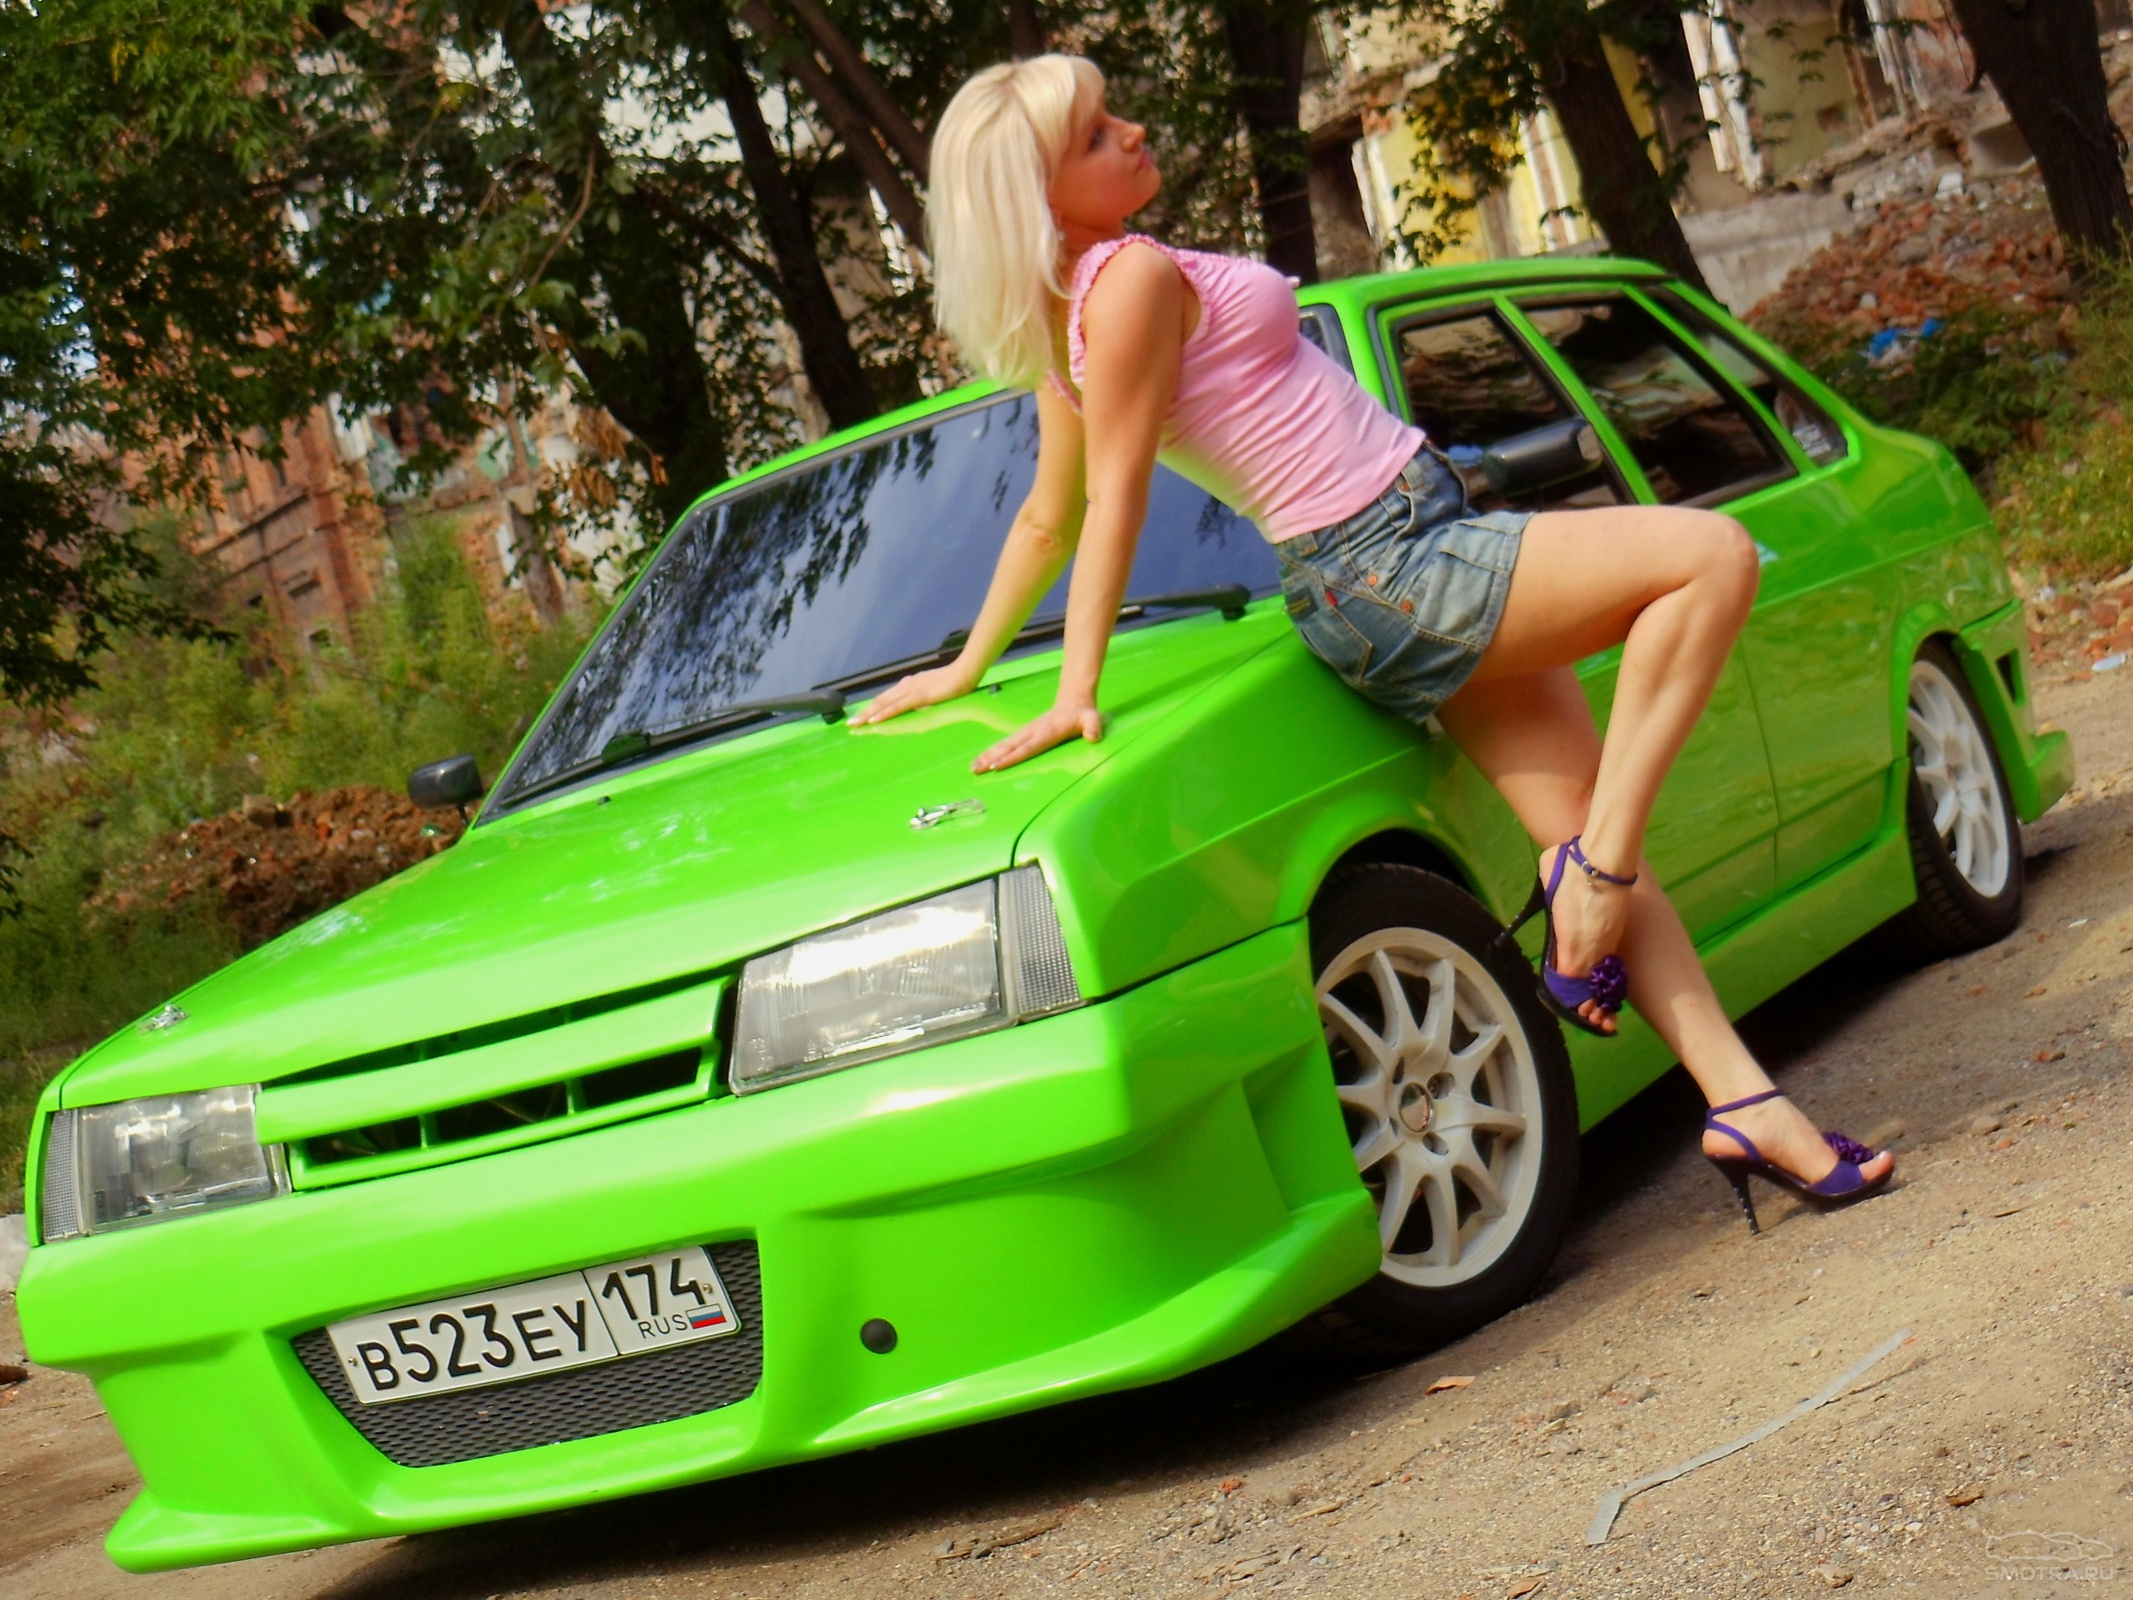 Фото голые девушки и ваз, Ваз и девушки ВКонтакте 6 фотография